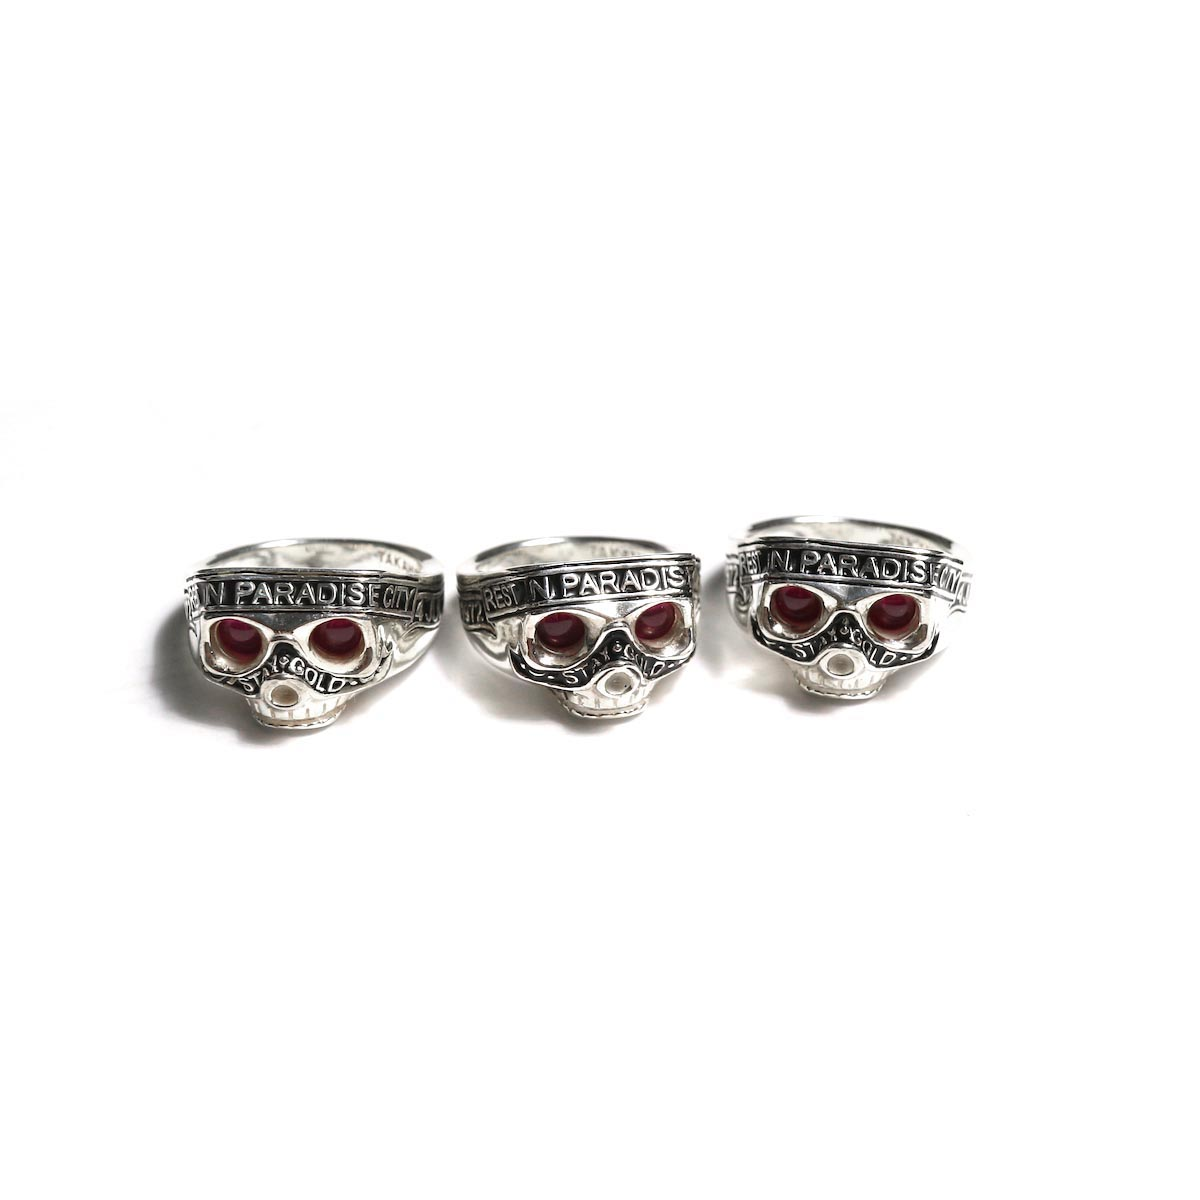 The Soloist × RATS / sratsa.0002 skull ring.